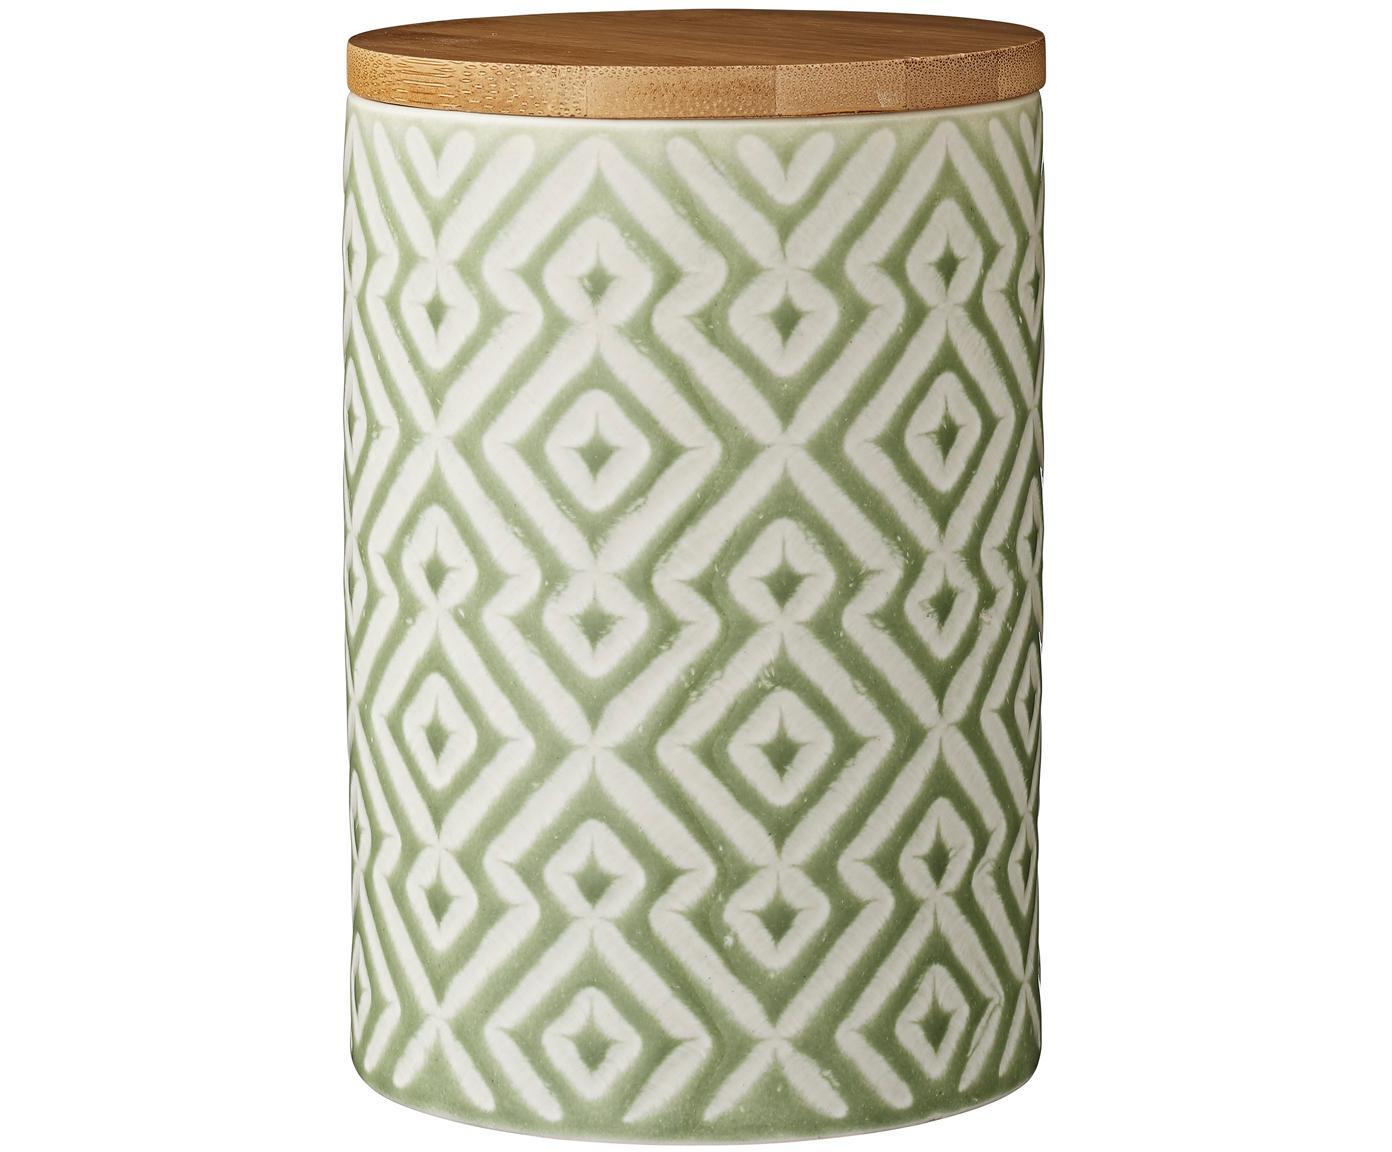 Aufbewahrungsdose Abella, Dose: Keramik, Deckel: Bambus, Dose: Hellgrün, Weiß<br>Deckel: Bambus, Ø 11 x H 17 cm